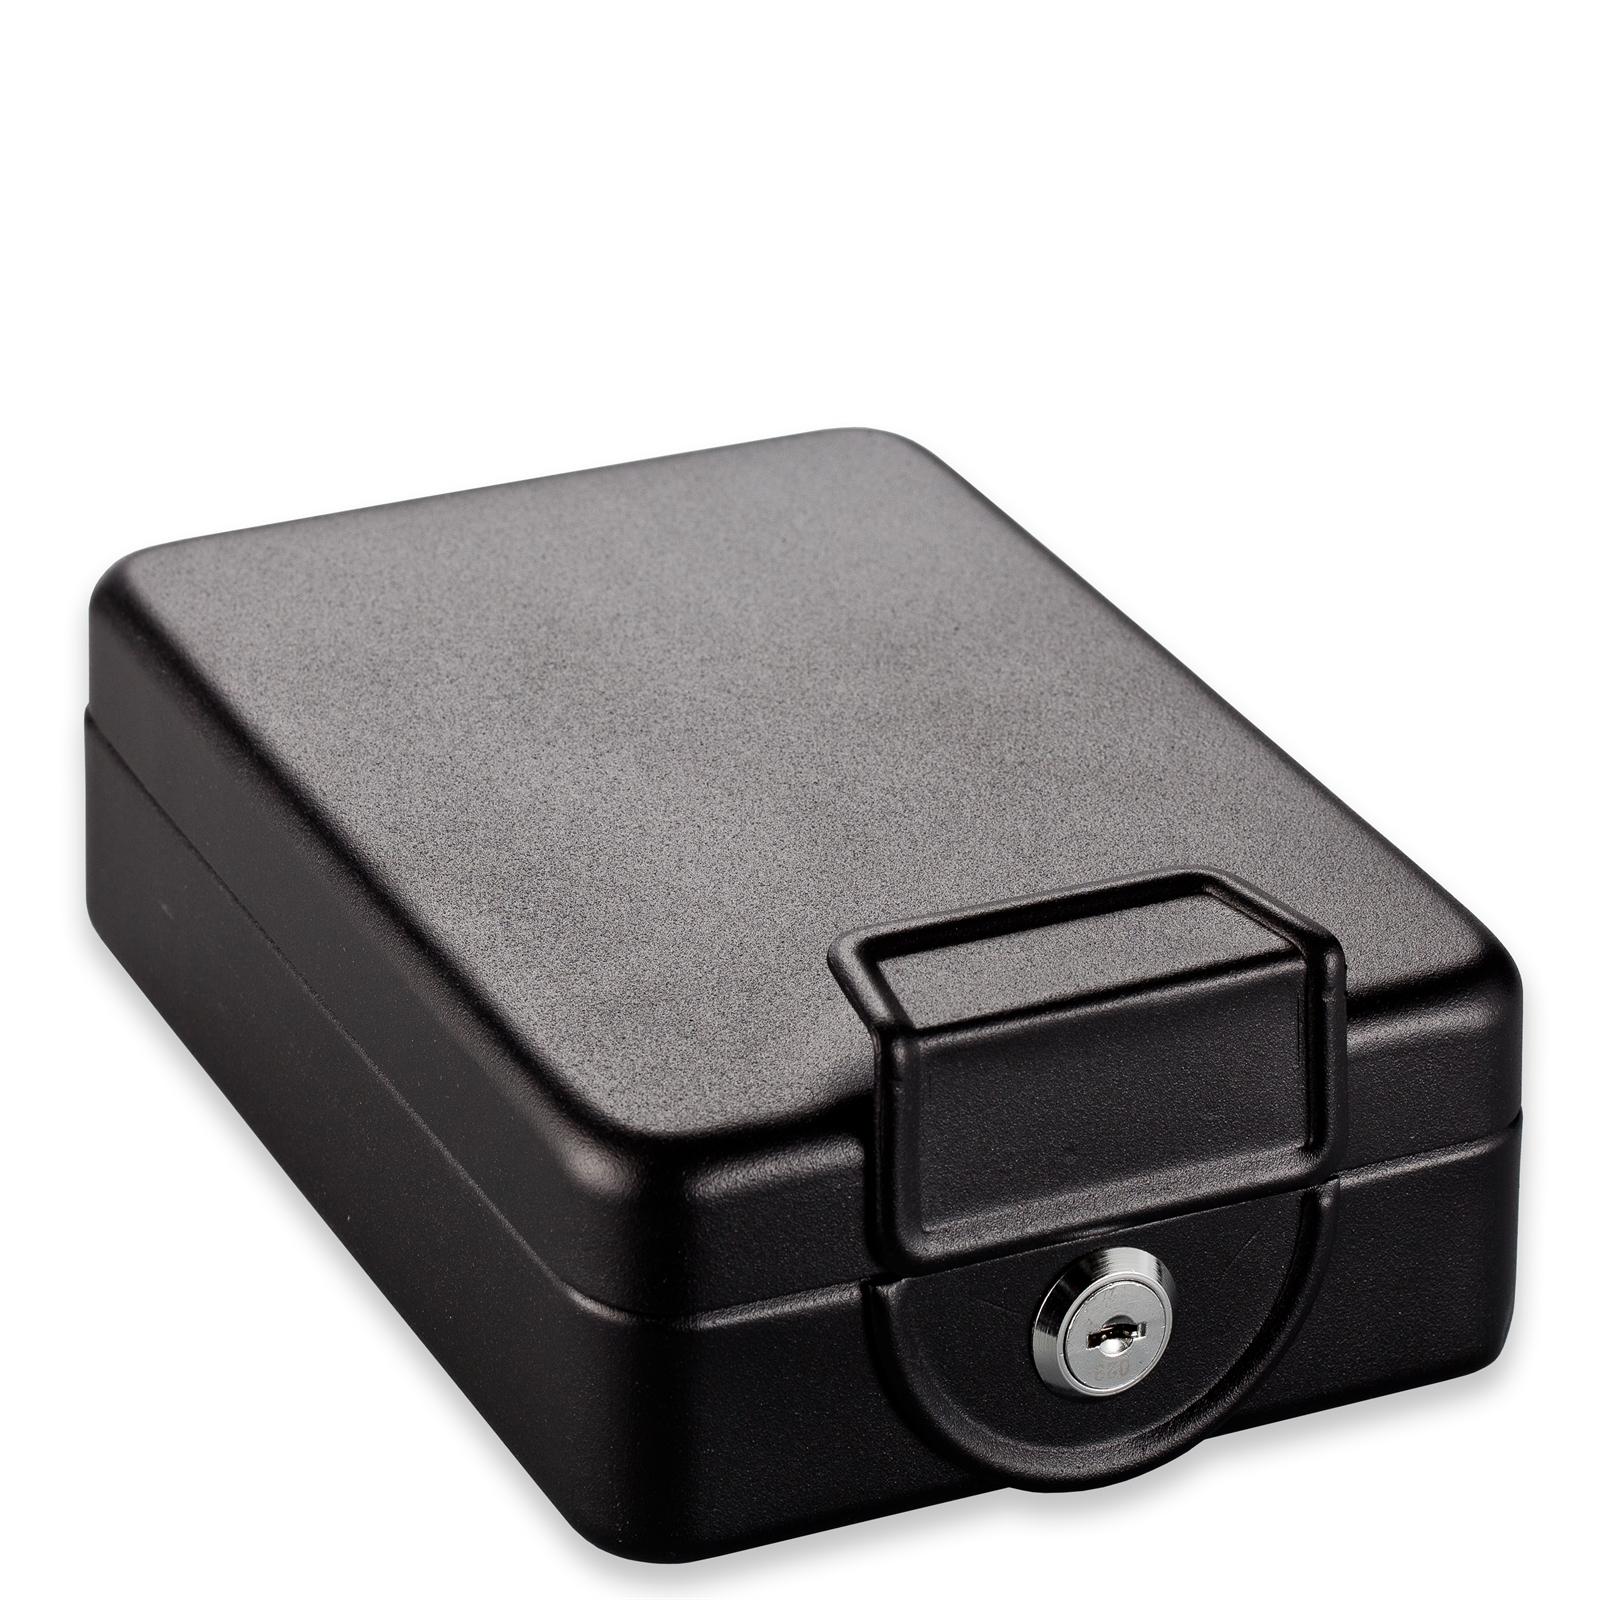 Sandleford 210 x 155 x 55mm Safety Box